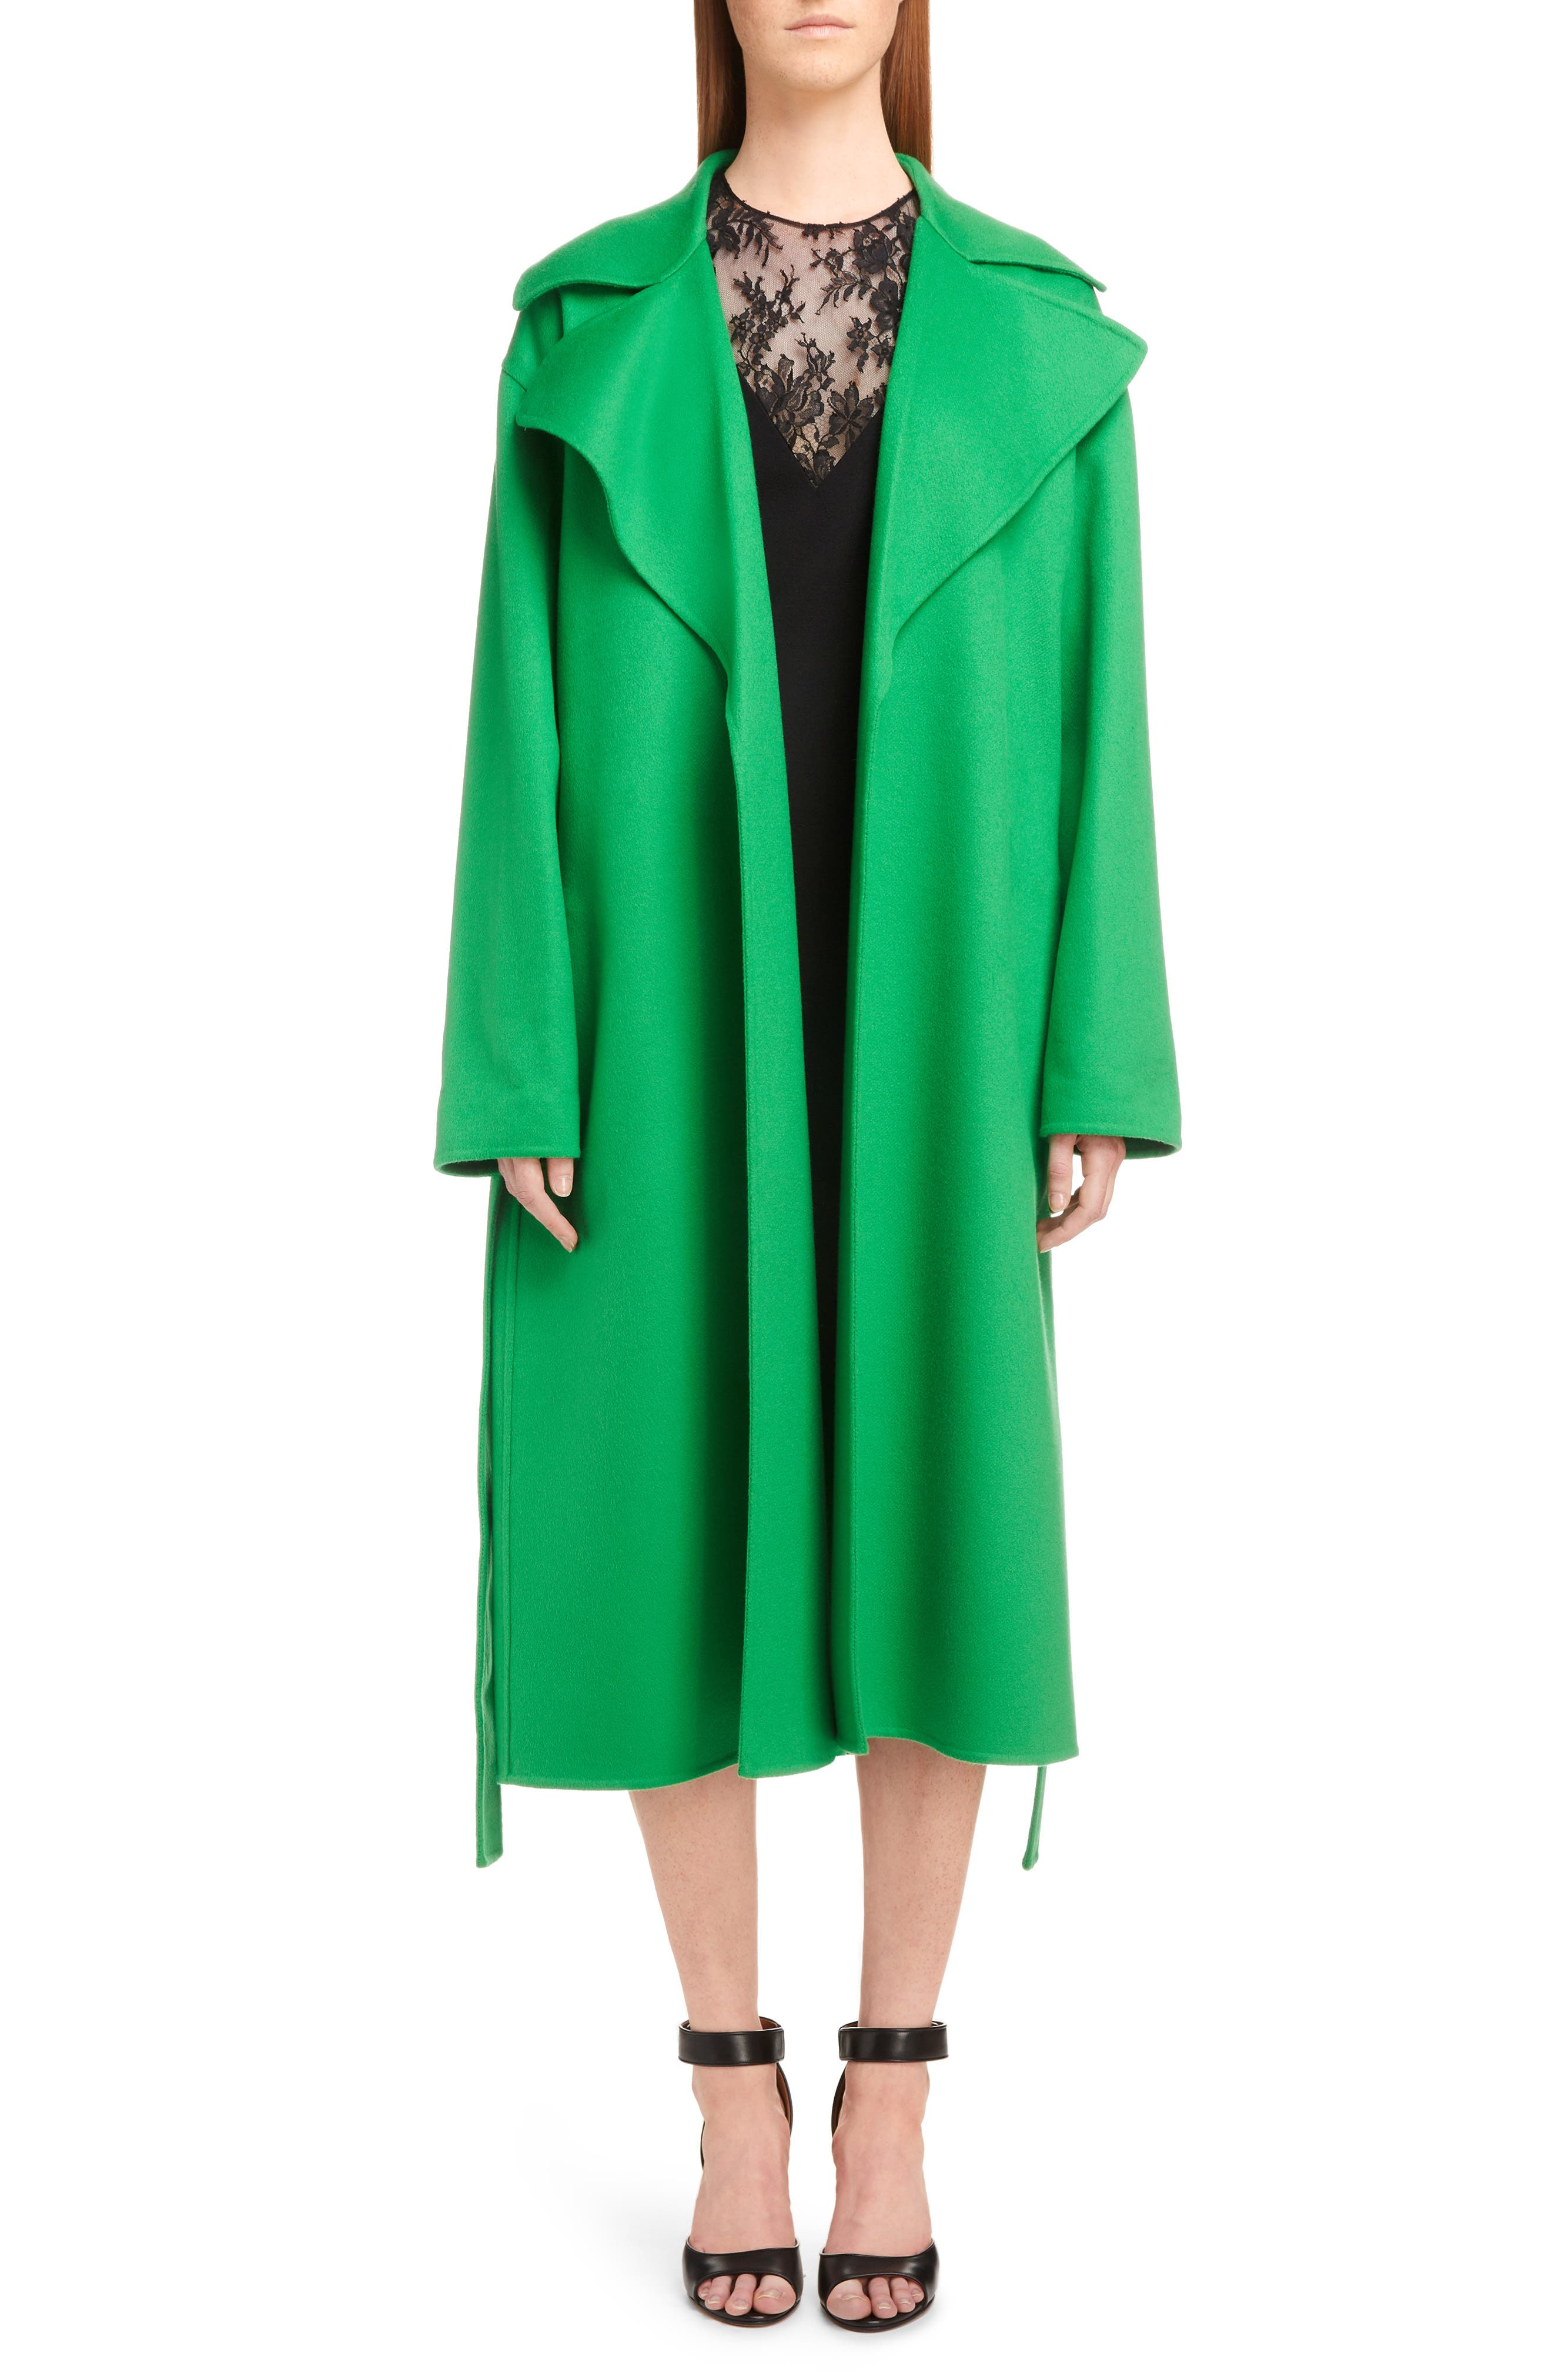 Lace Illusion Dress,                             Alternate thumbnail 6, color,                             001-BLACK